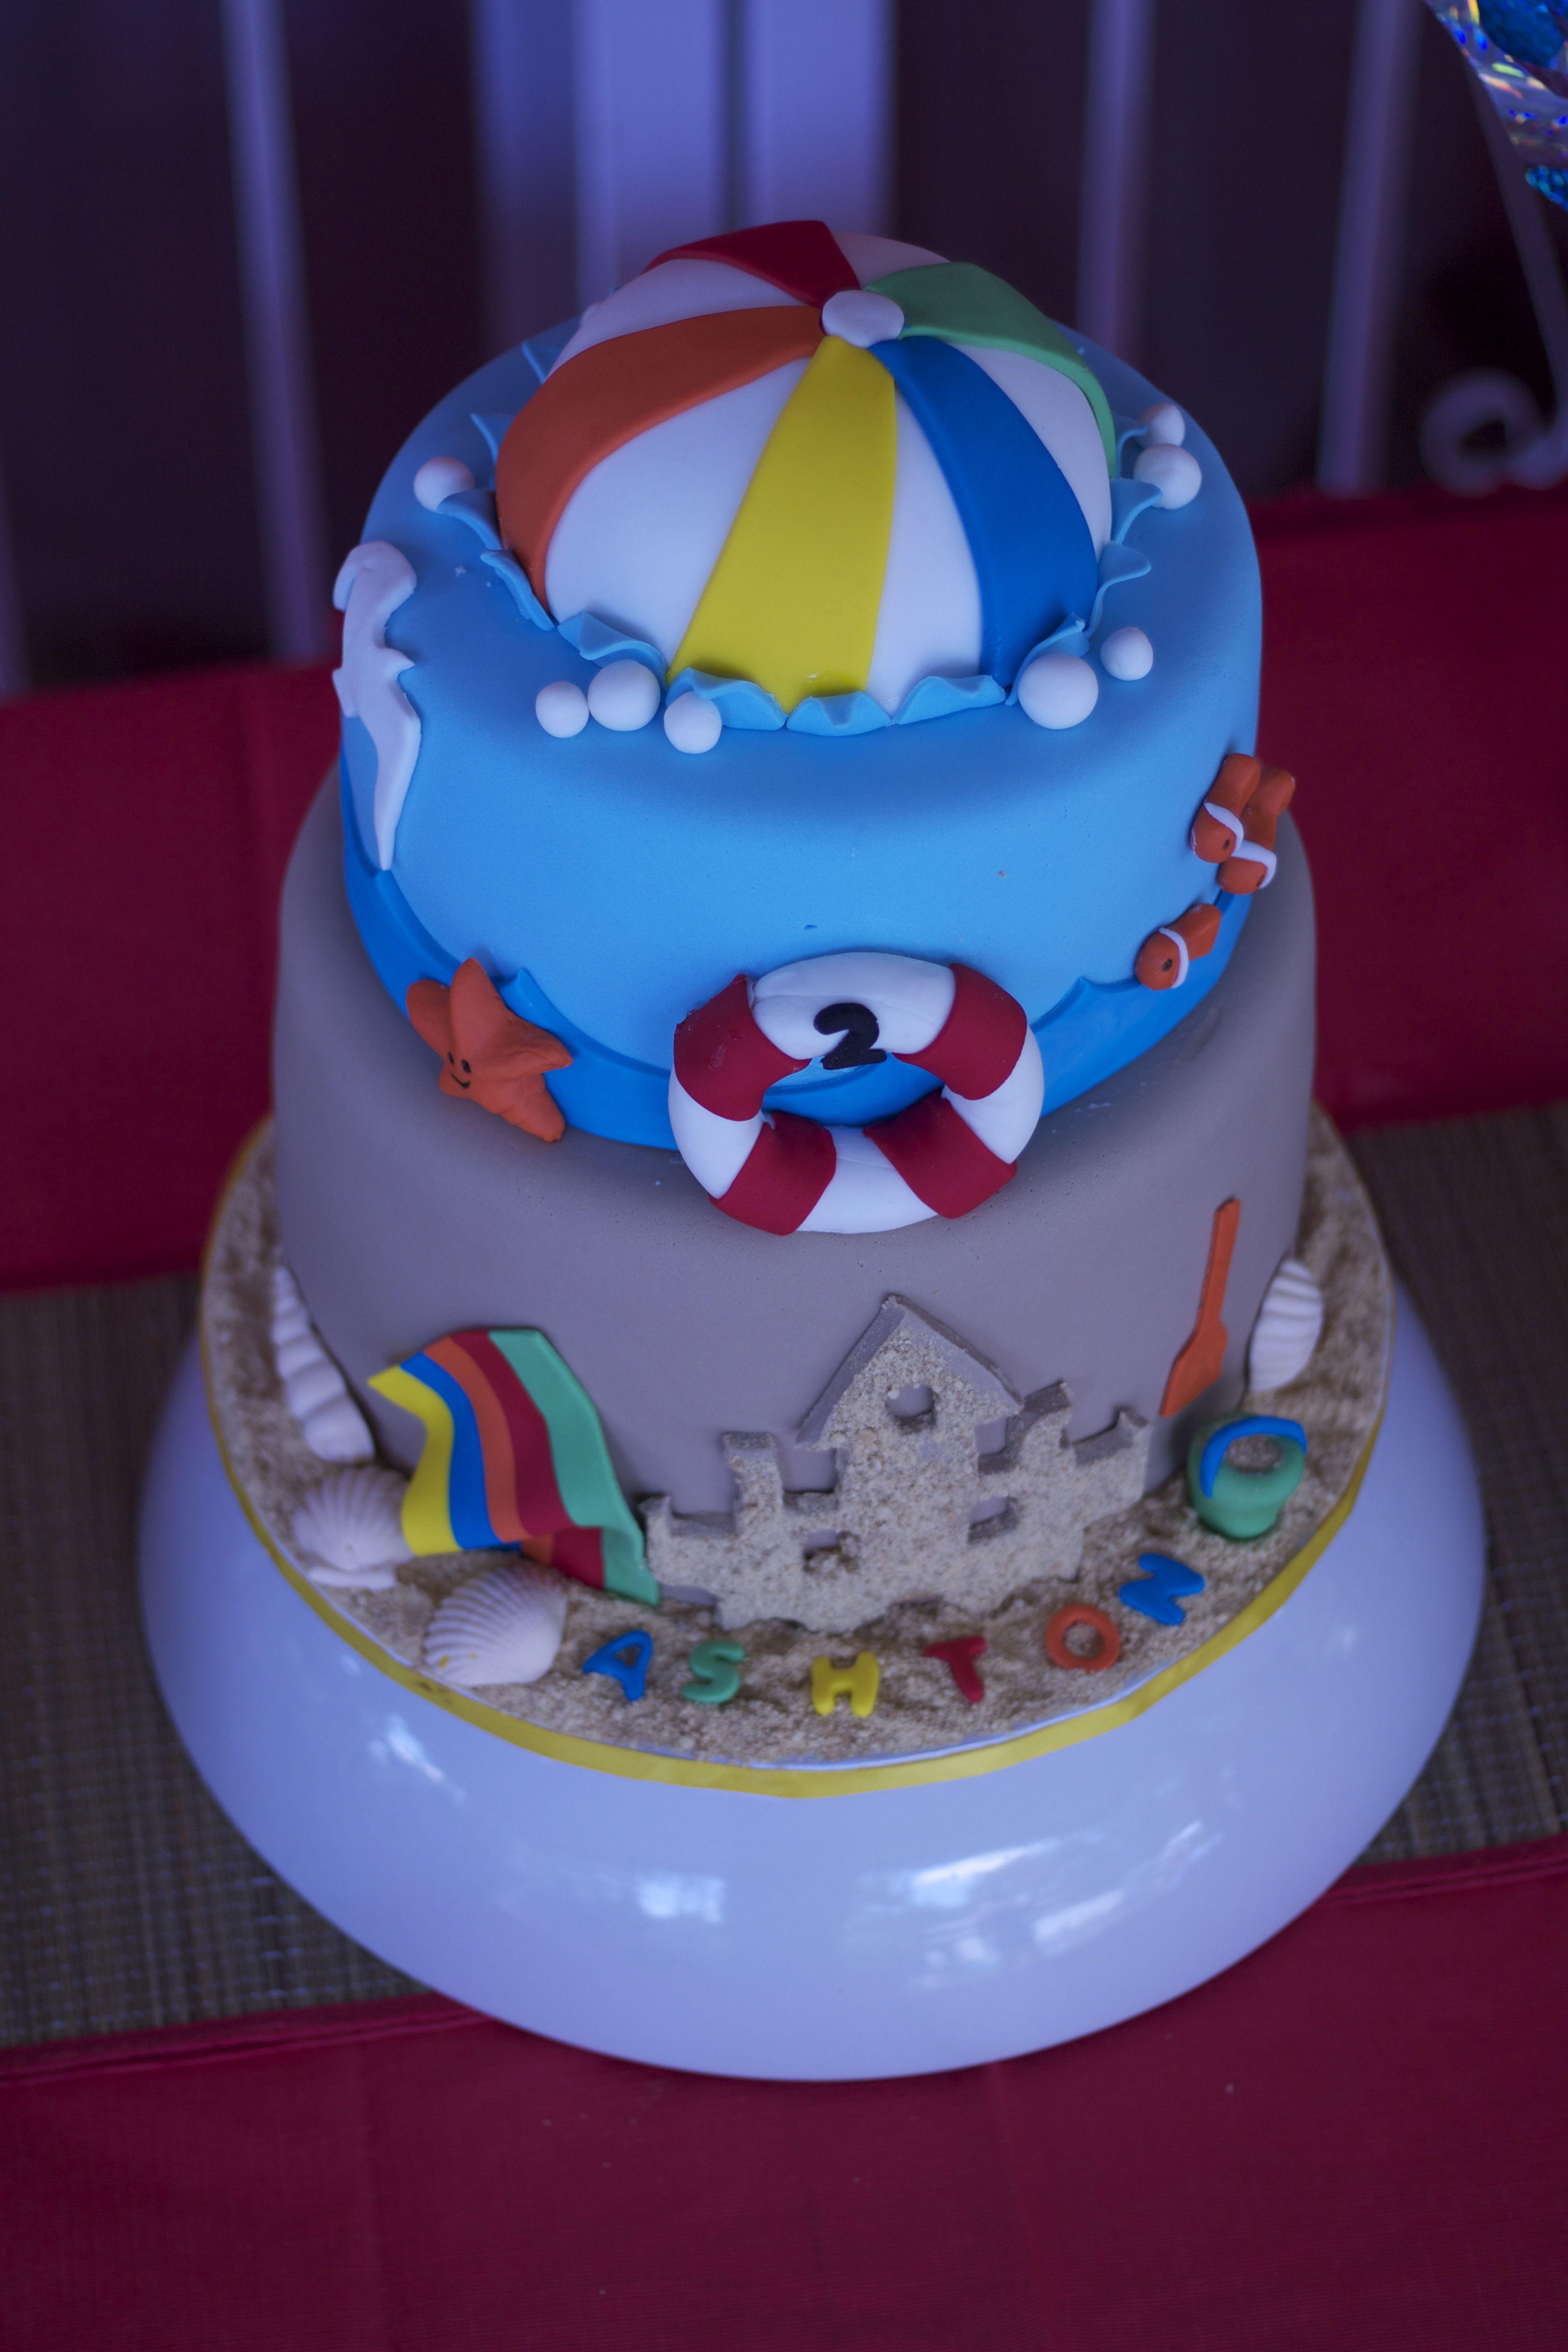 Beach Ball Cake Decorations Beach Ball Cake  Ashton's 2Nd Birthday  Pinterest  Beach Ball